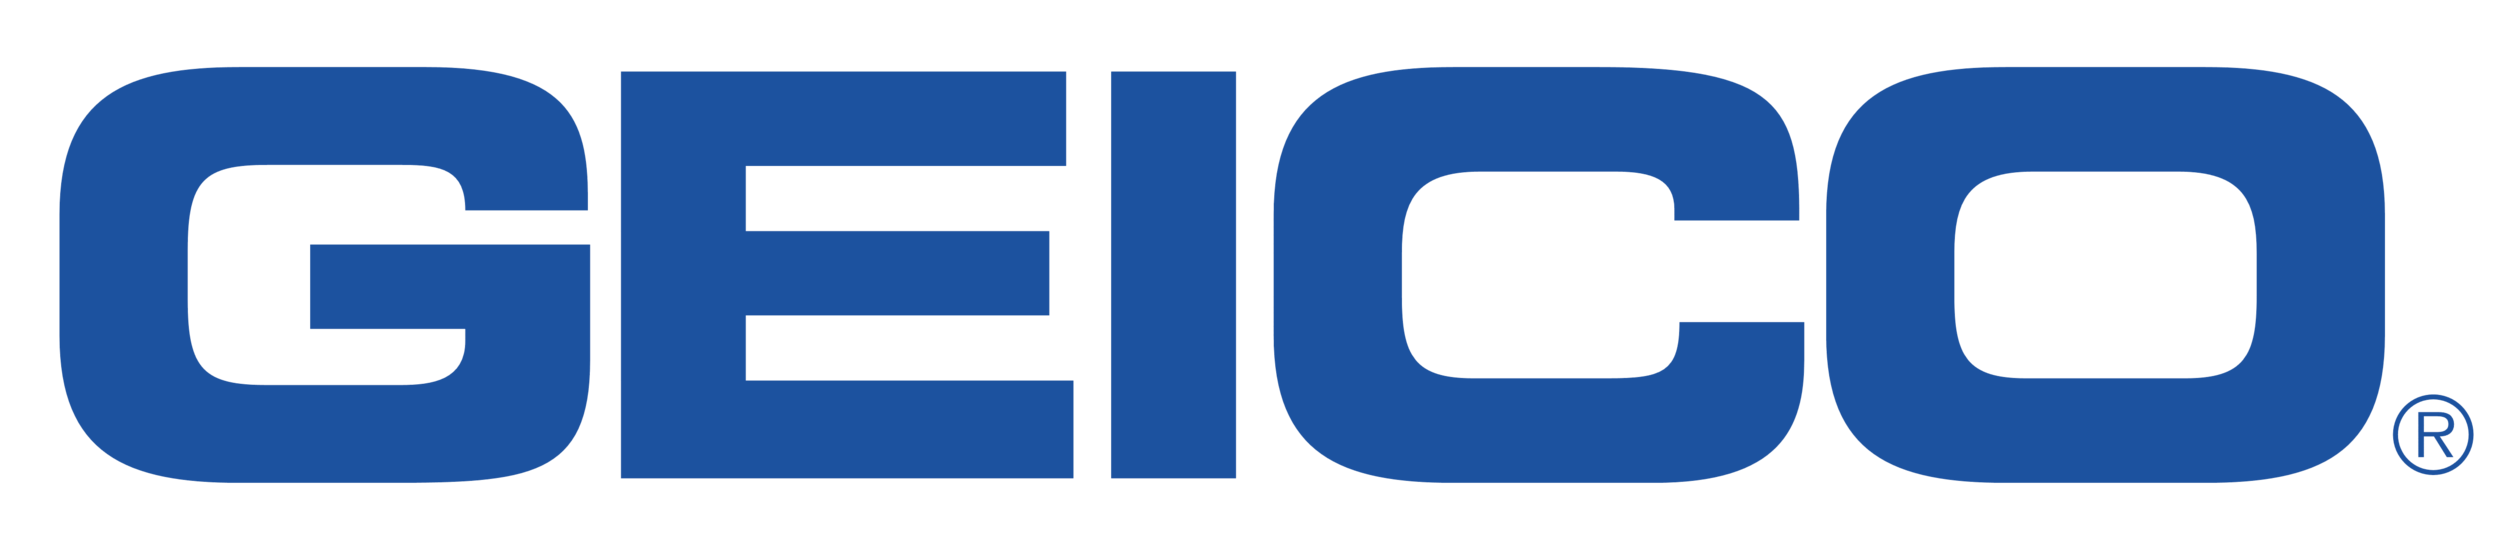 Geico_logo (1).png